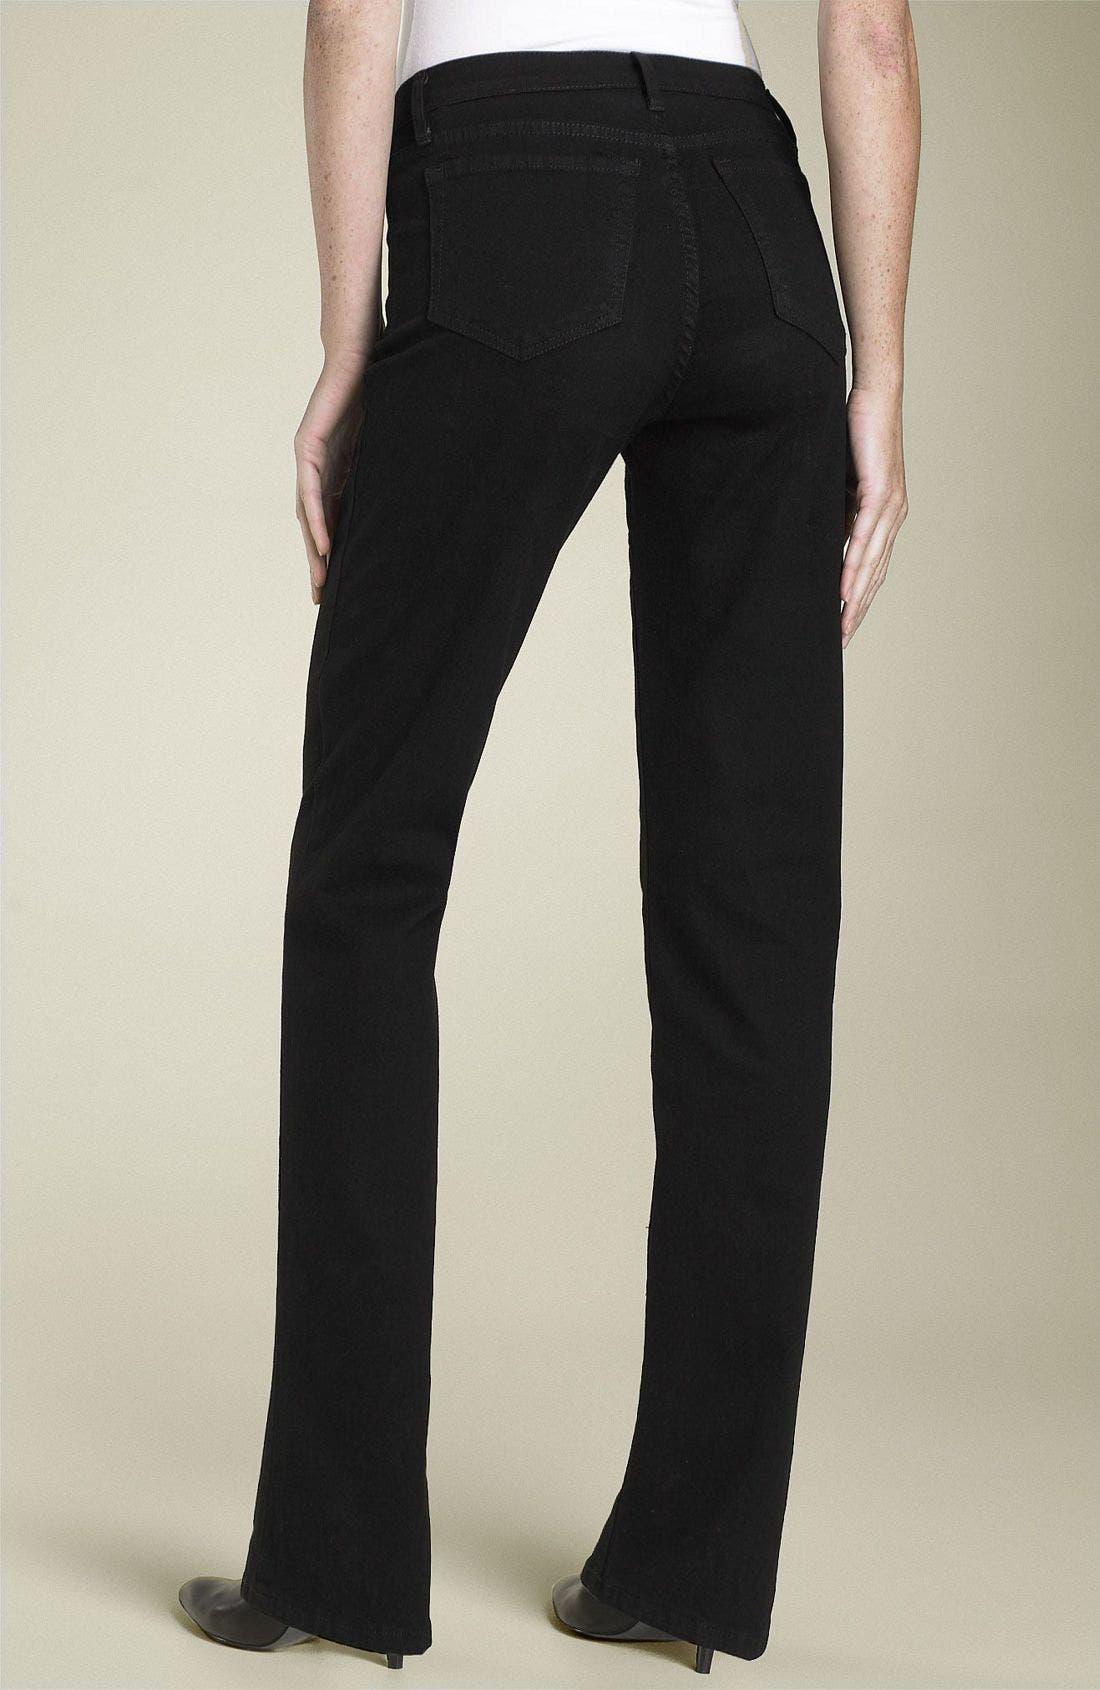 Main Image - NYDJ Stretch Straight Leg Jeans (Petite)